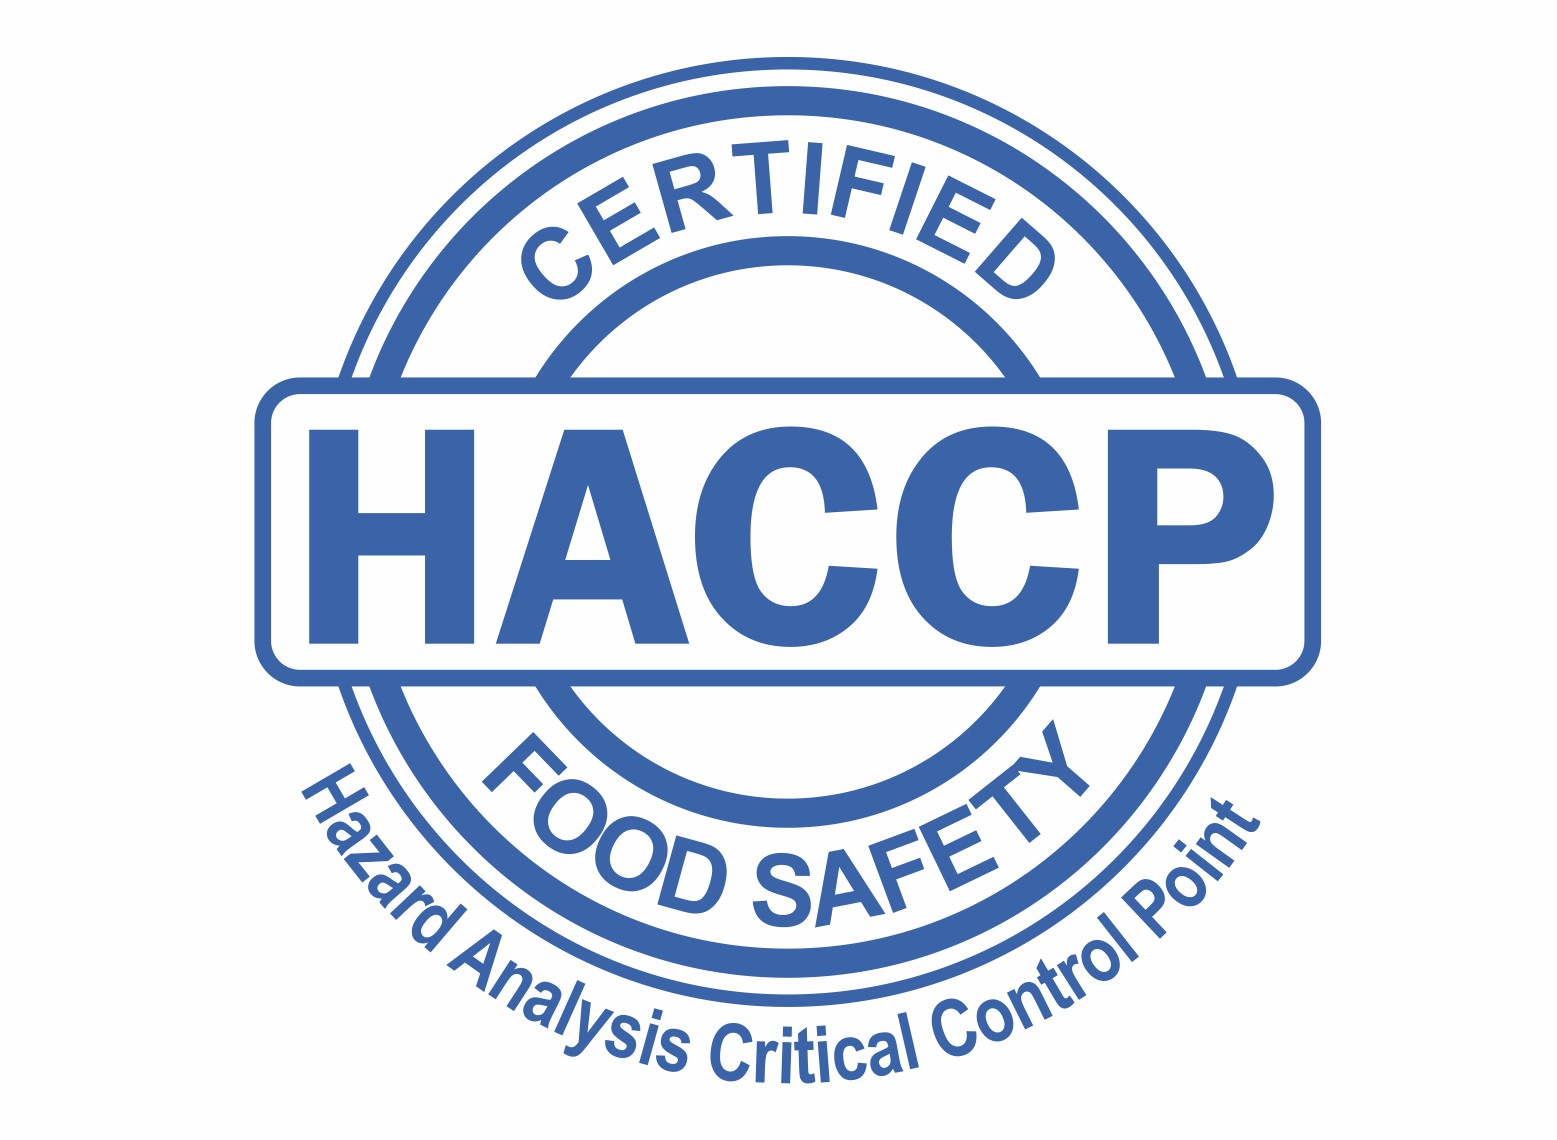 HACCP-Certification-Logo-for-News-webpage.jpg